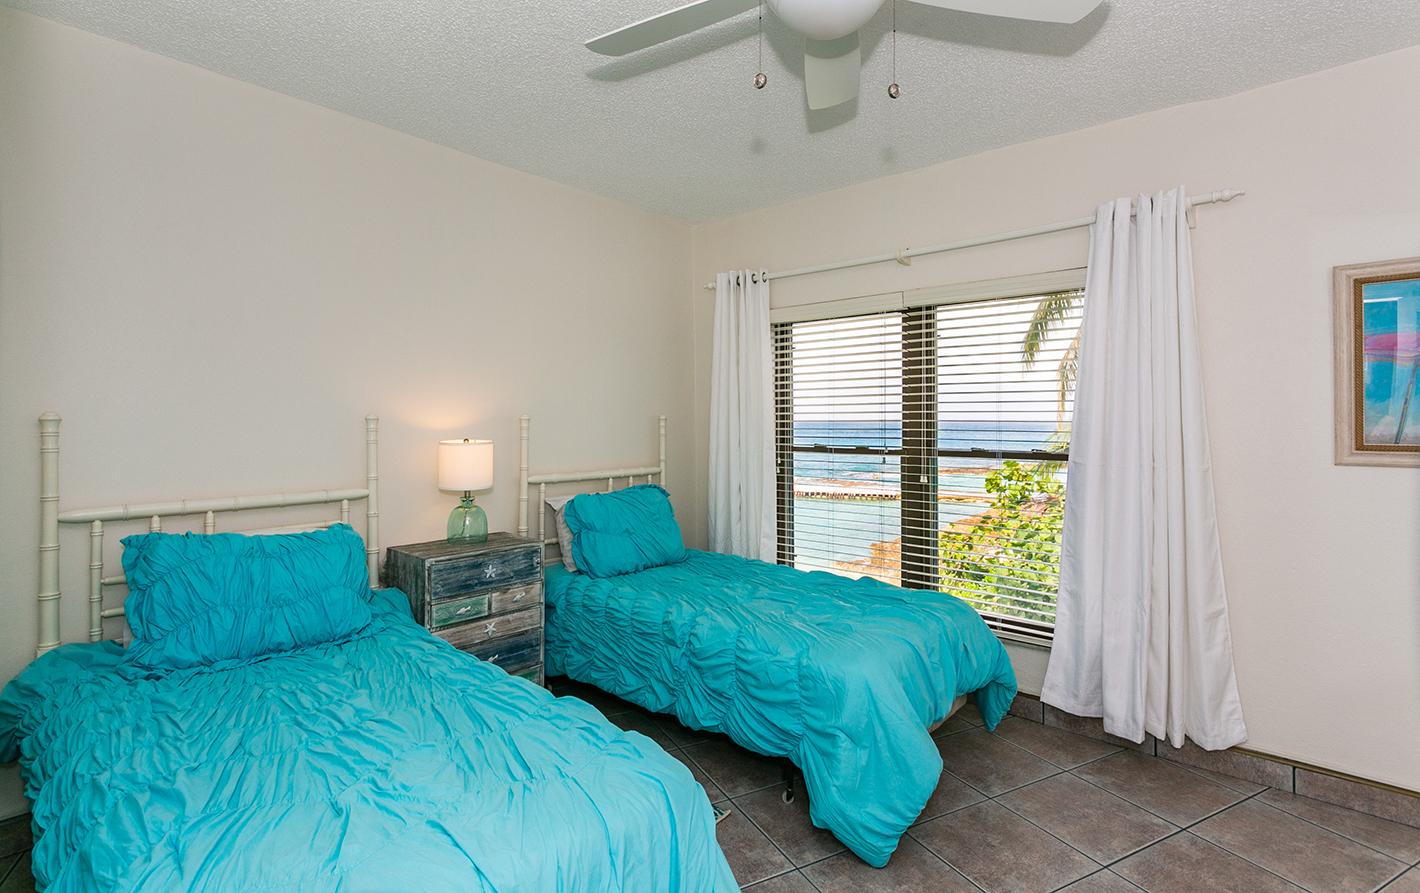 Georgetown Villas #201 Guest Bedroom